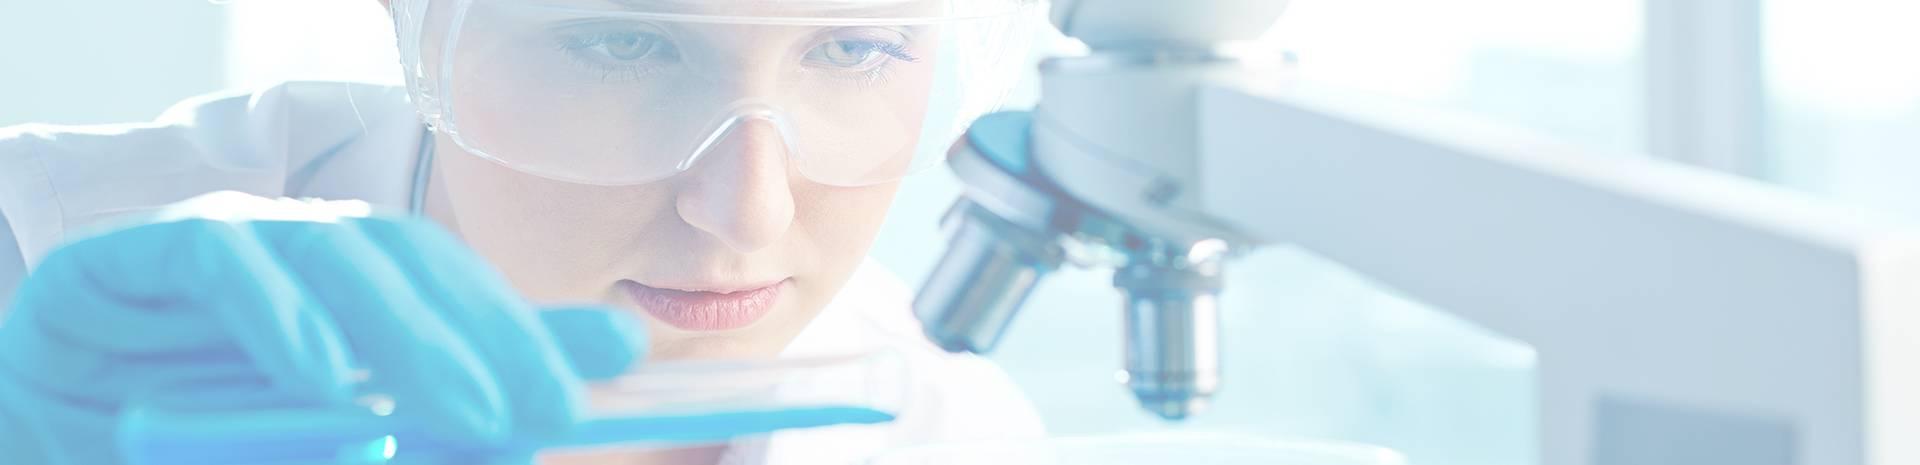 laboratior analisis clinicos castellon